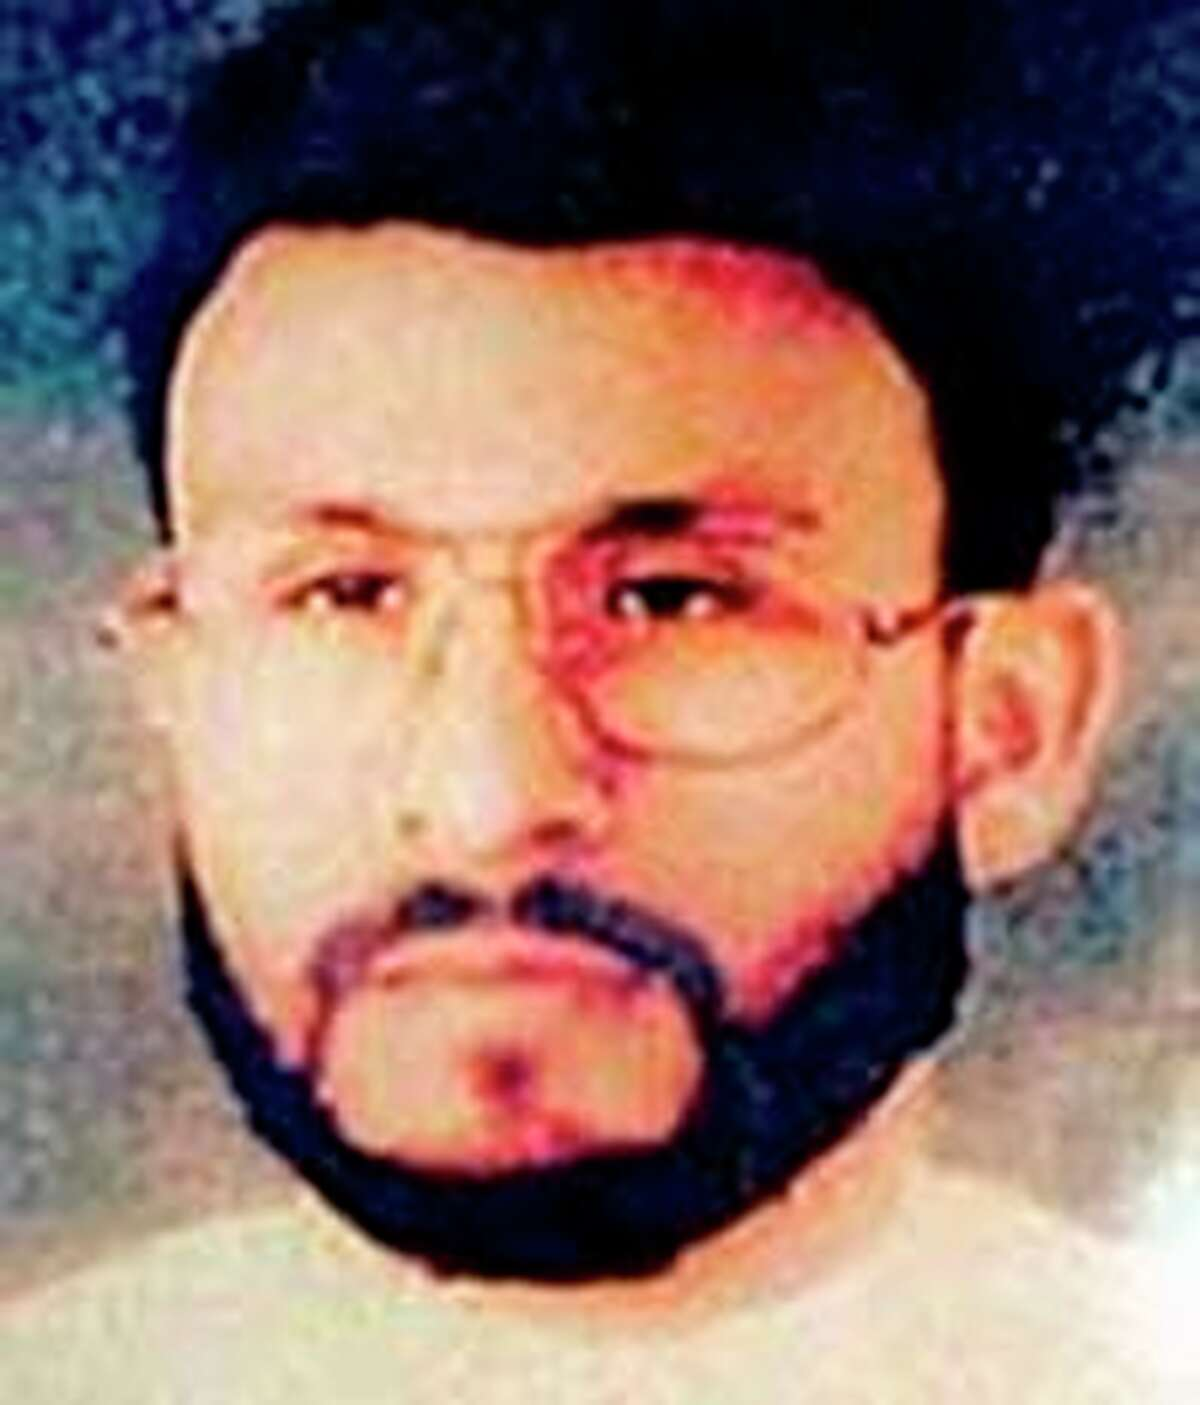 His lawyers say Abu Zubaydah suffered brain damage.